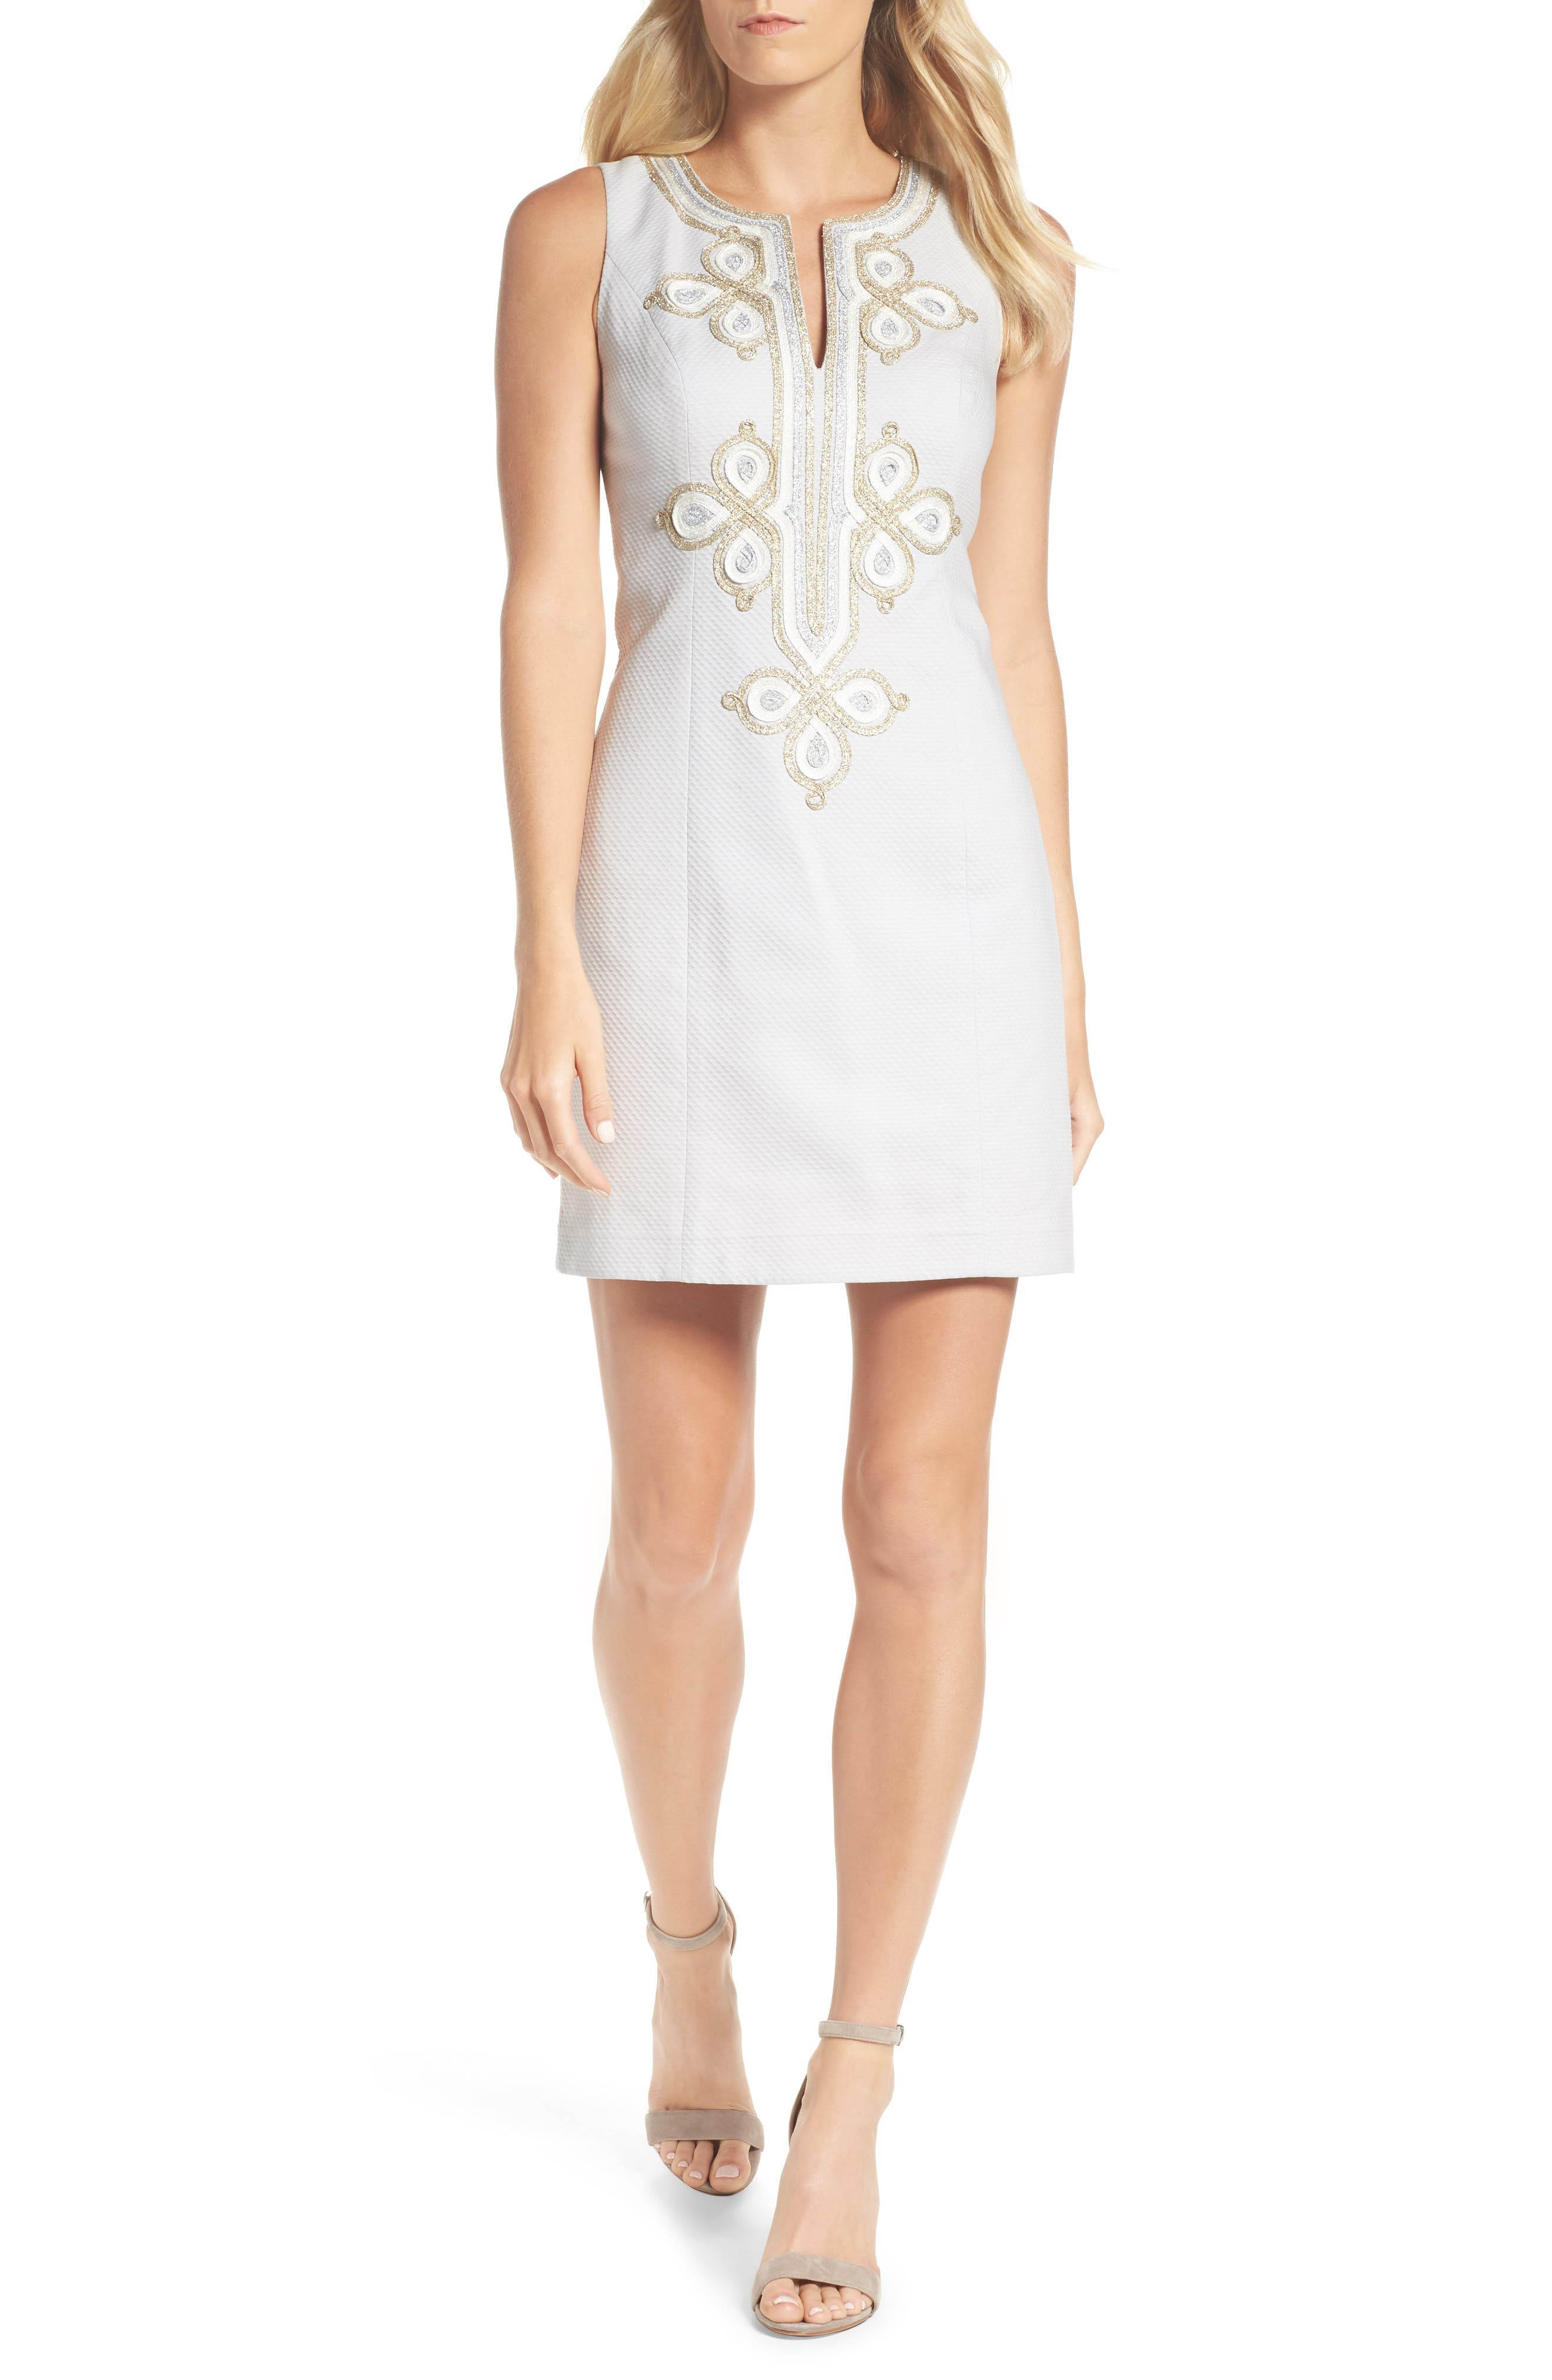 Main Image - Lilly Pulitzer® Mila Shift Dress